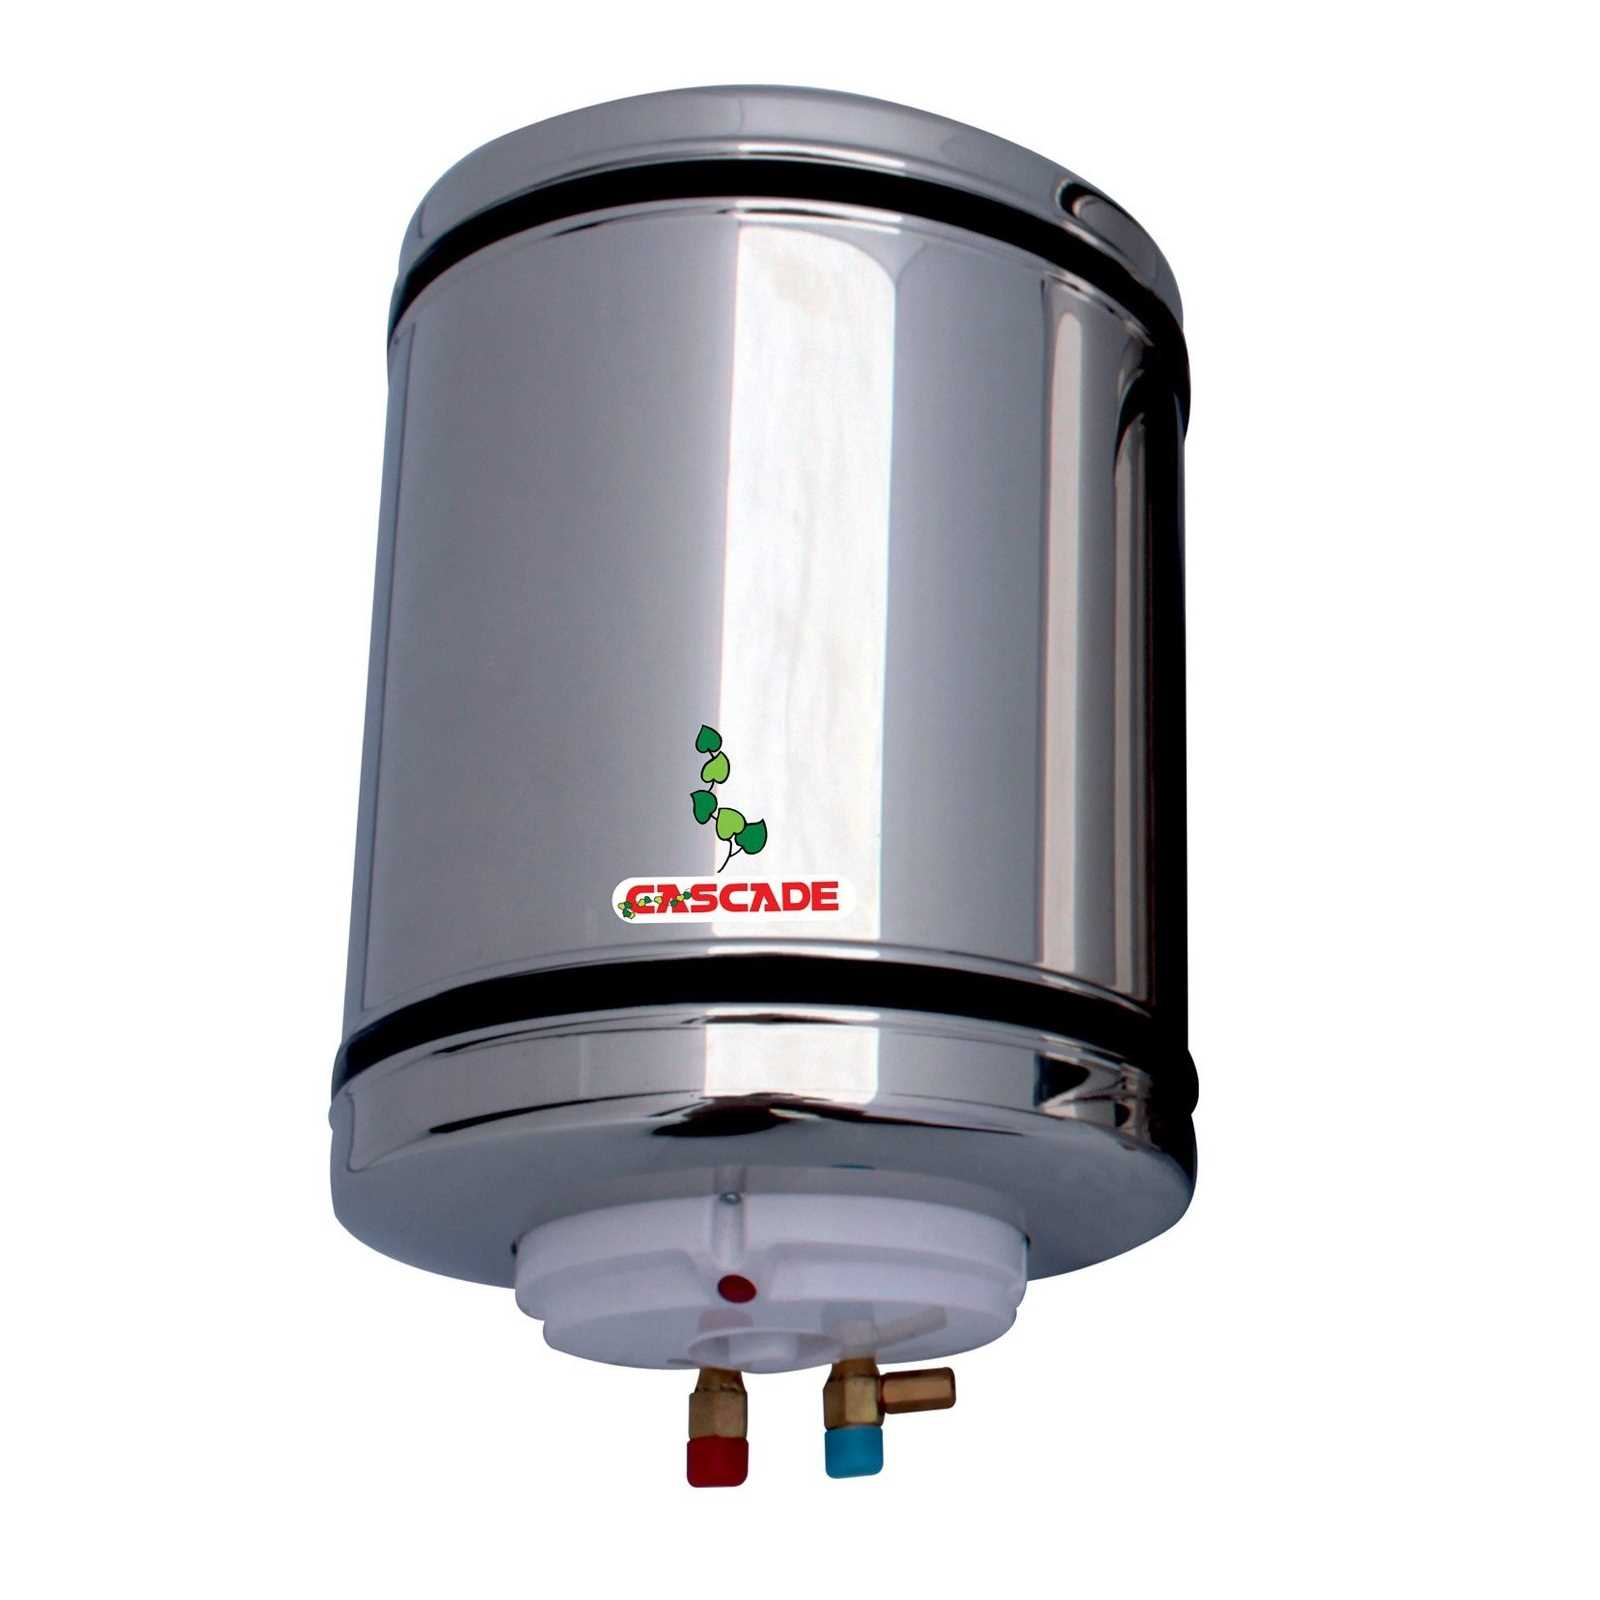 Cascade Tuffy Max Surge 10 Litre Storage Water Heater